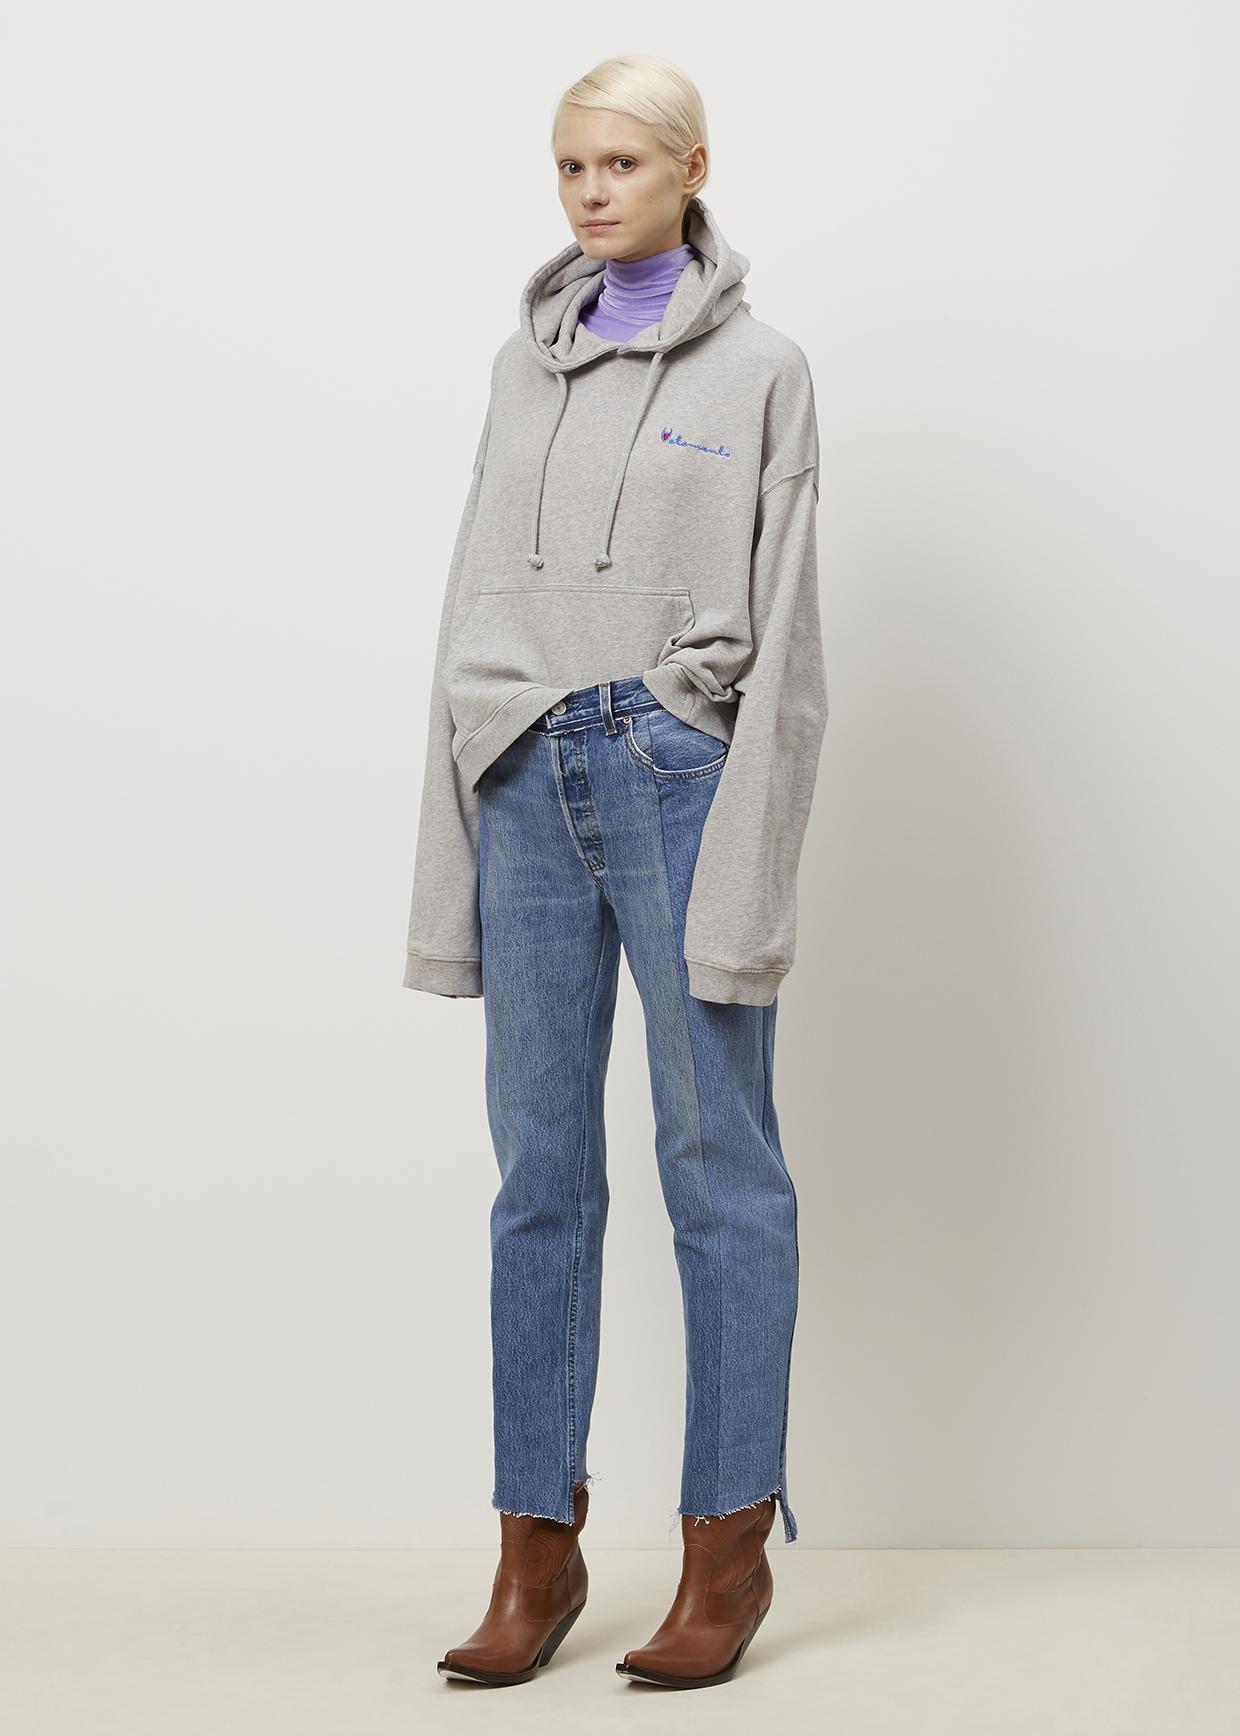 Vetements Grey Hoodie Sweatshirt in Gray   Lyst